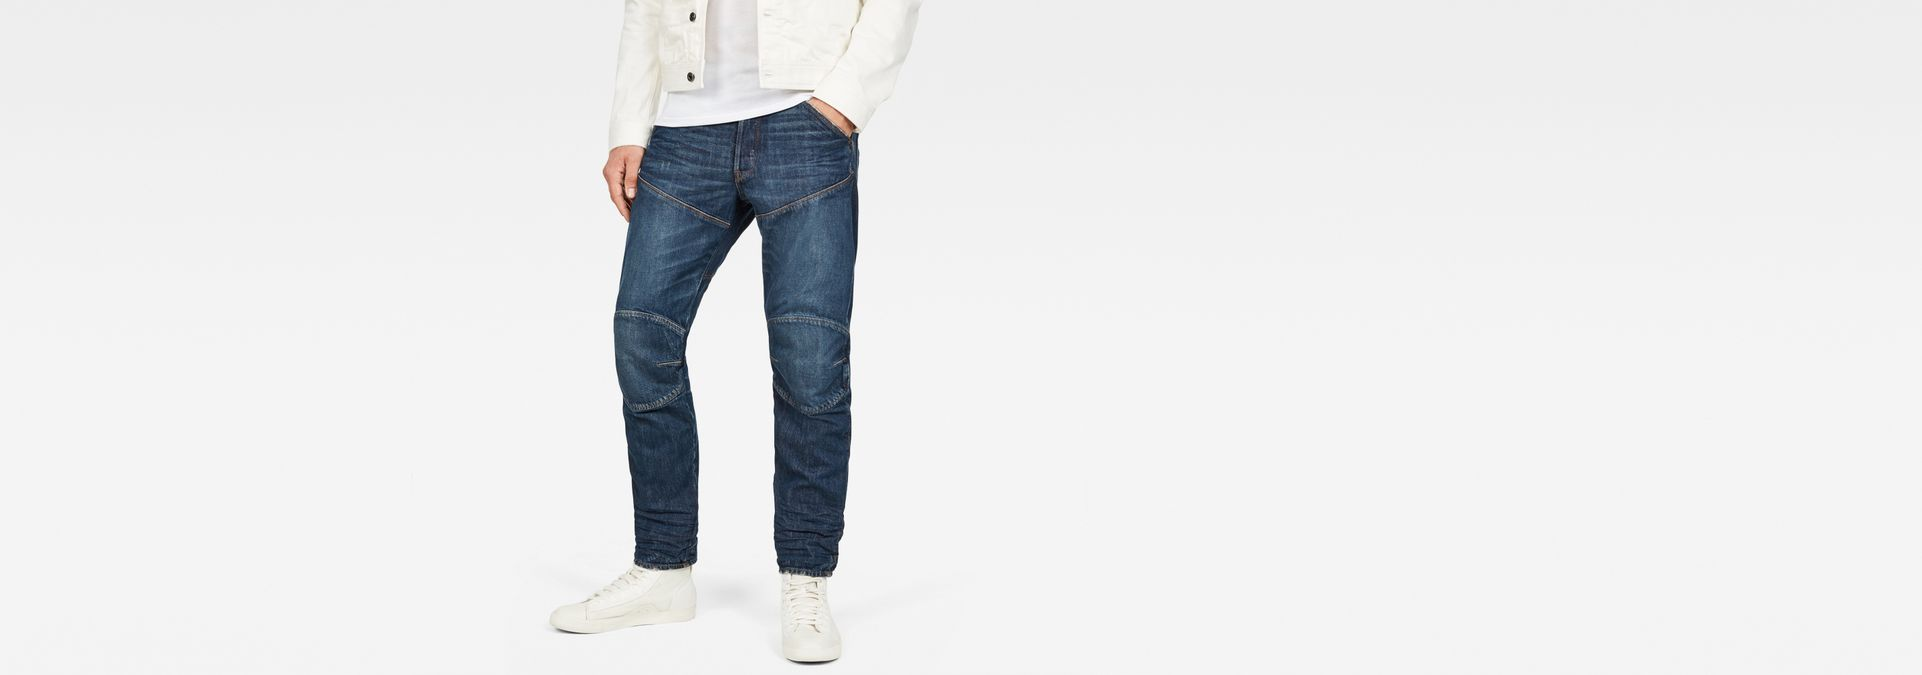 Rovulc Laver Les Jeans Mi G-star